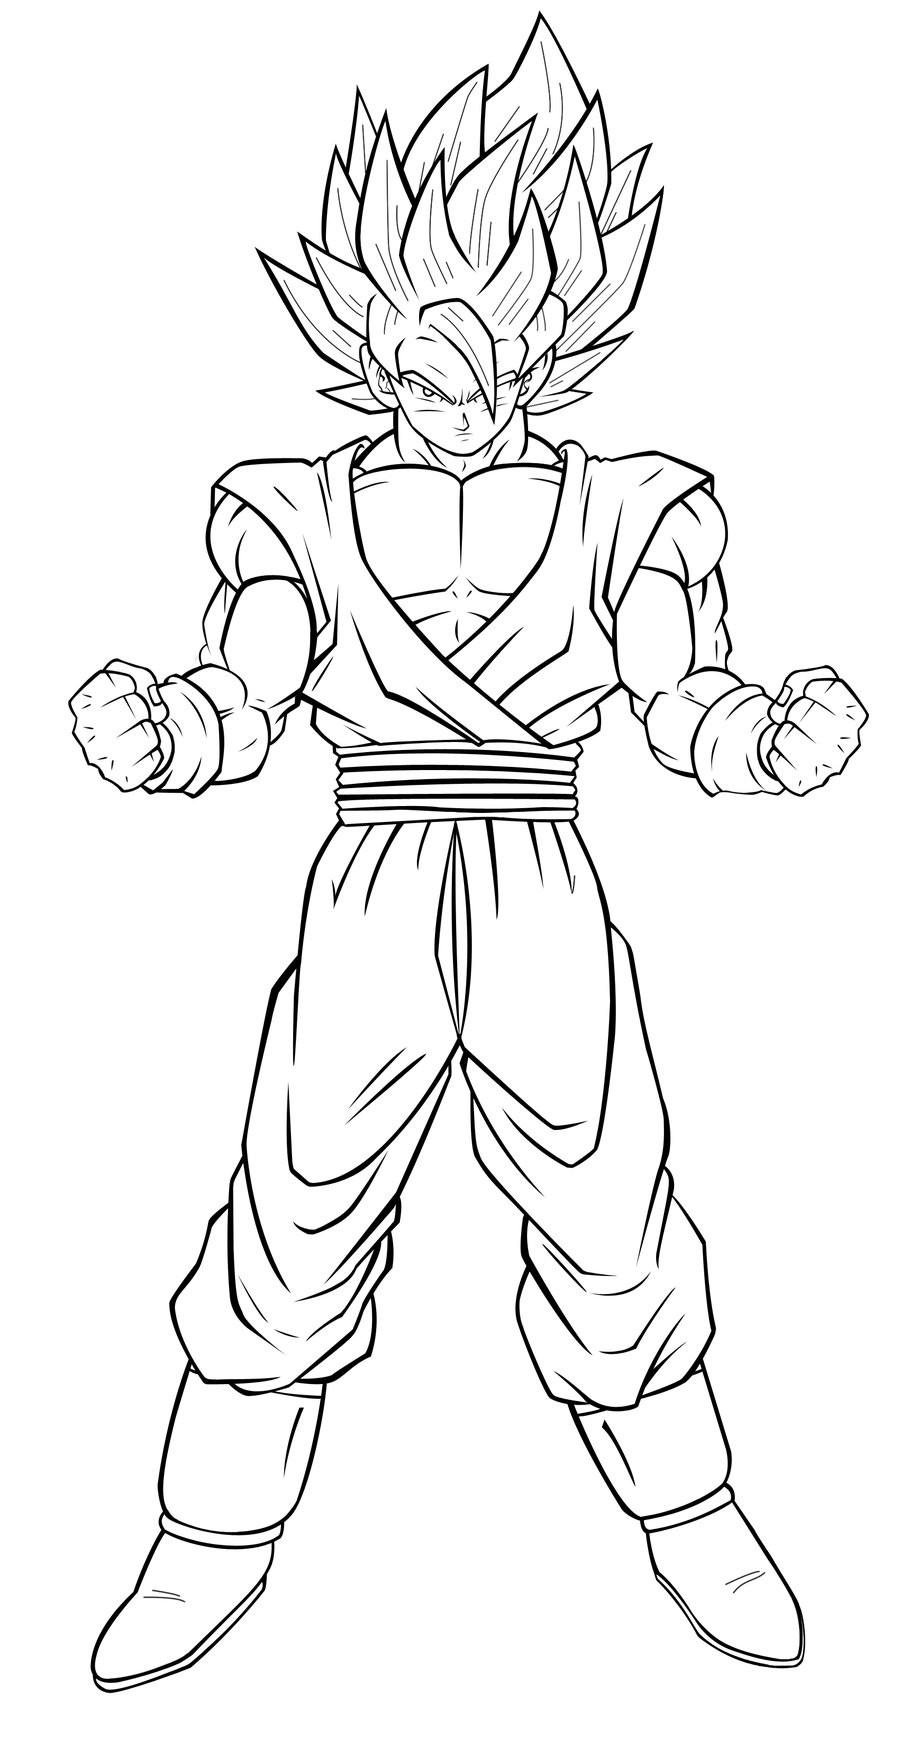 900x1737 Dragon Ball Z Coloring Pages Goku Super Saiyan Gotenks New